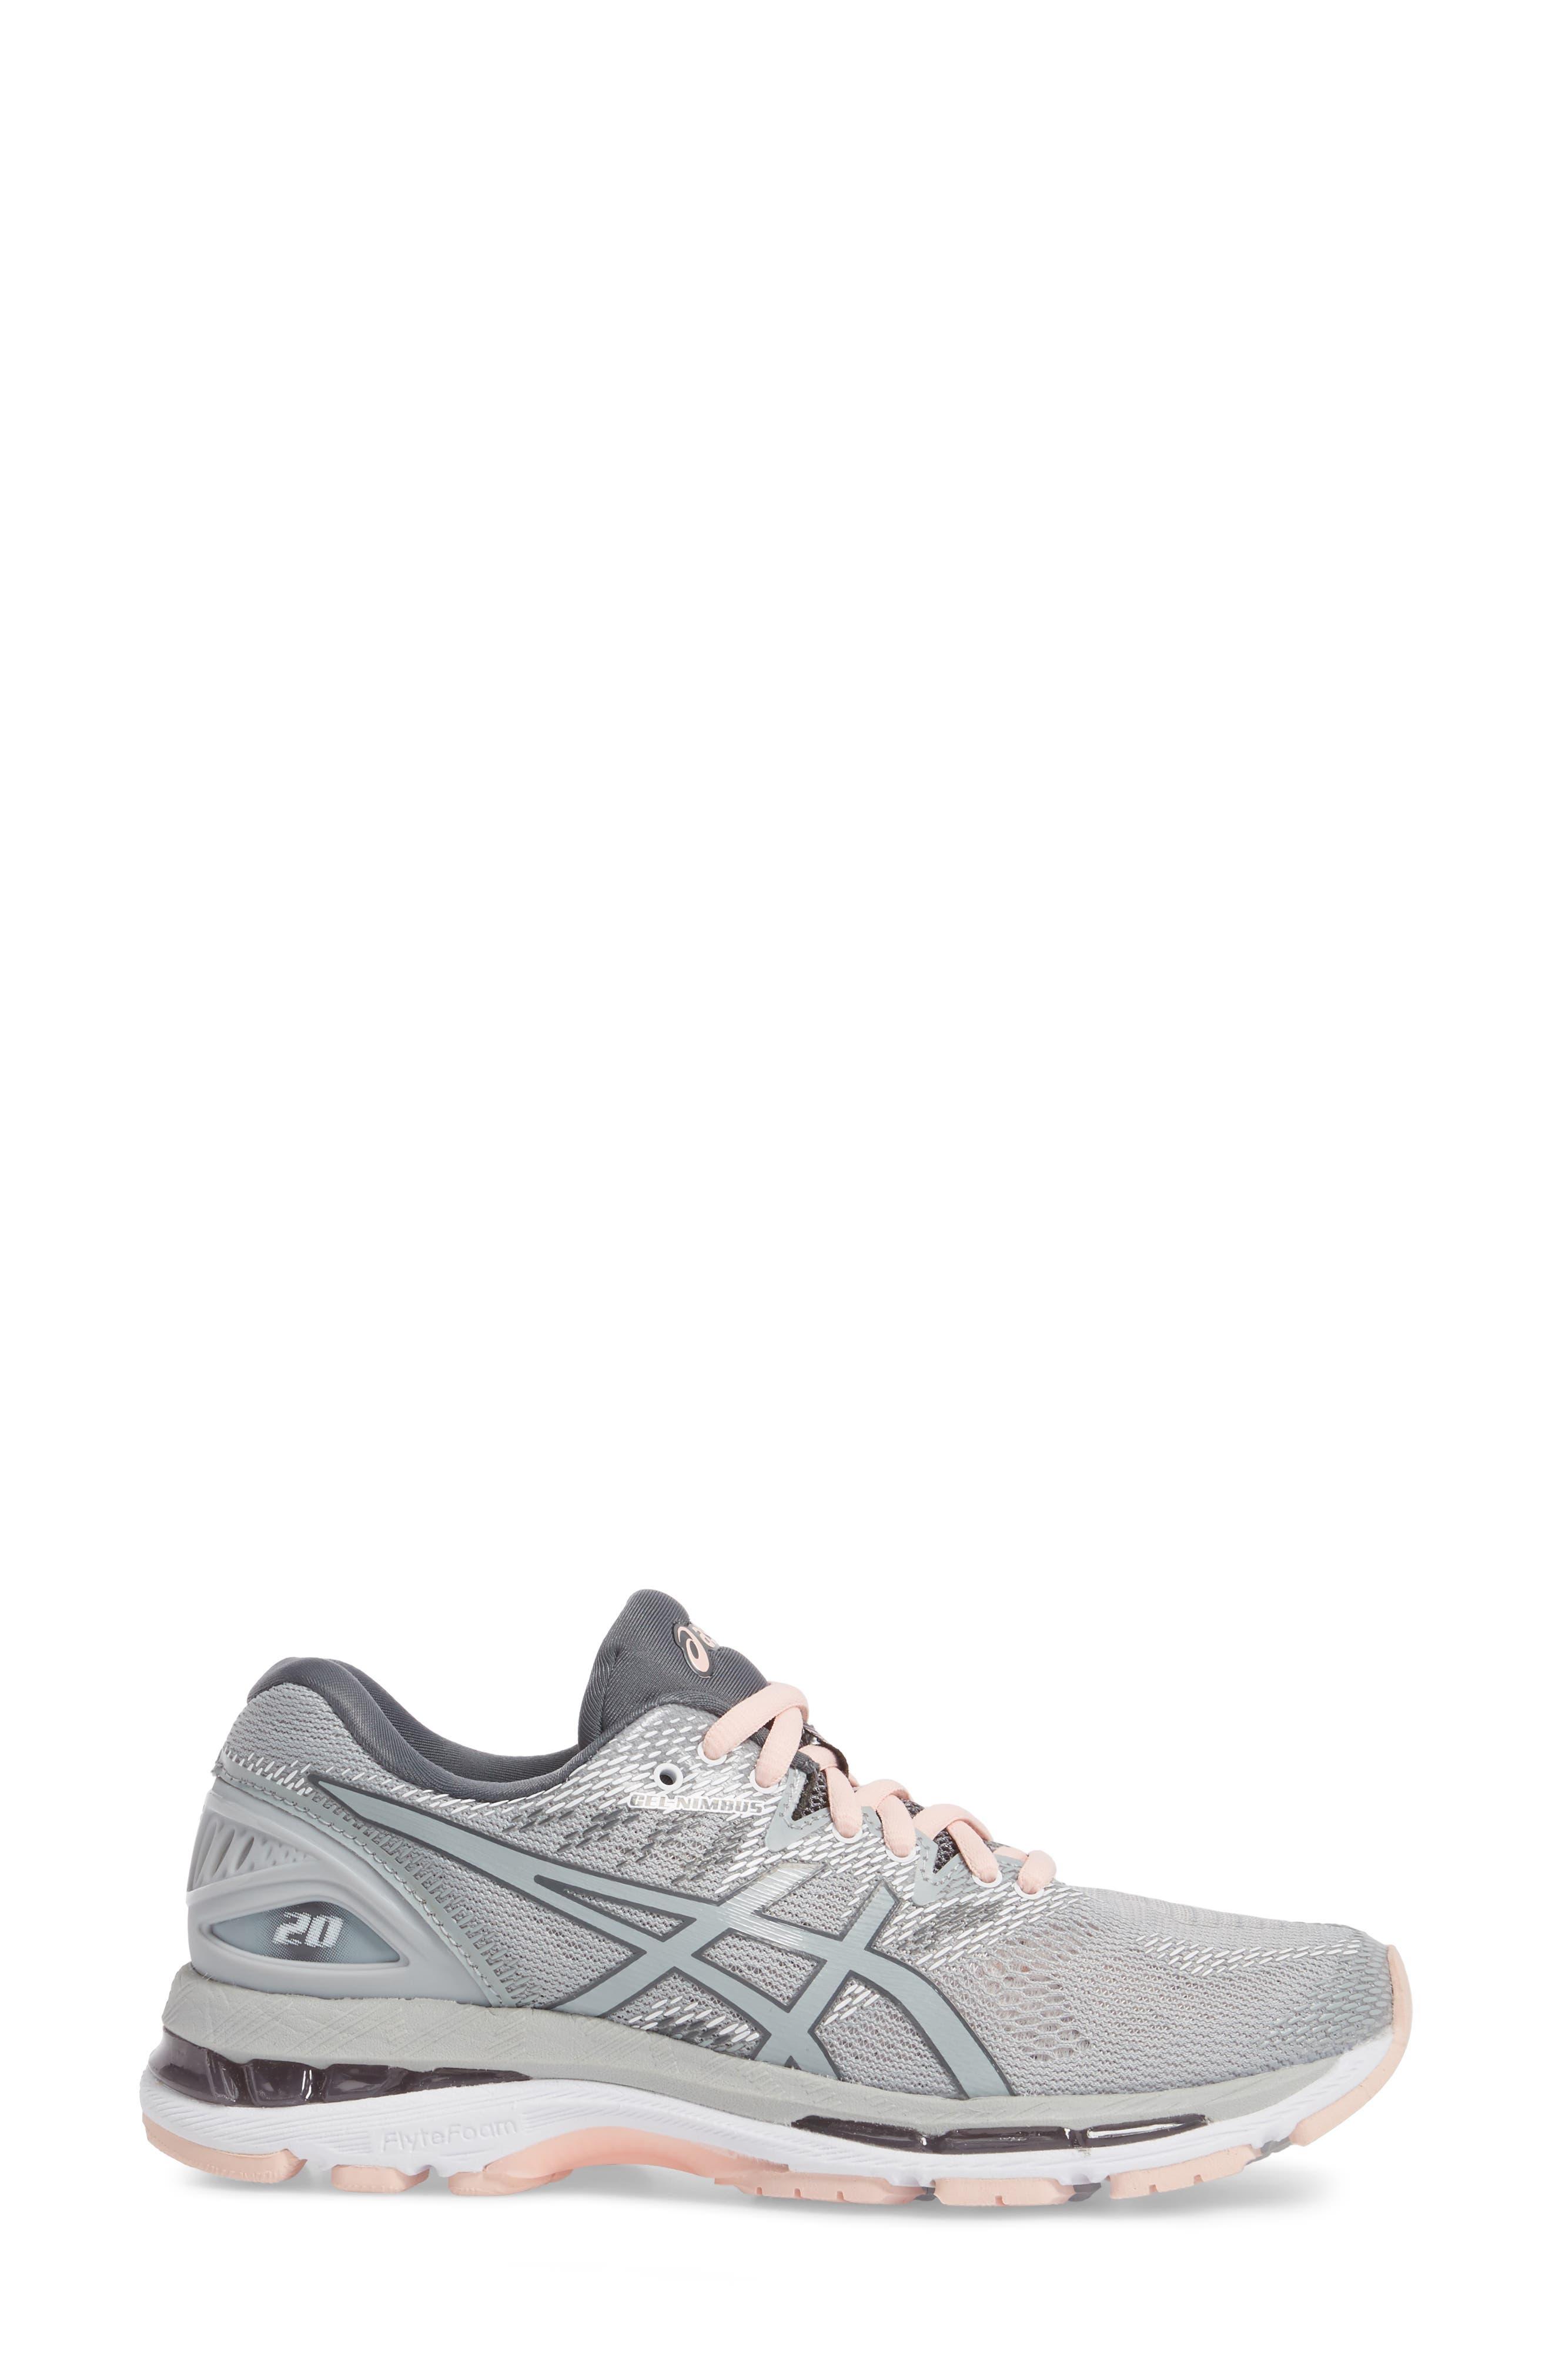 Alternate Image 3  - ASICS® GEL®-Nimbus 20 Running Shoe (Women)